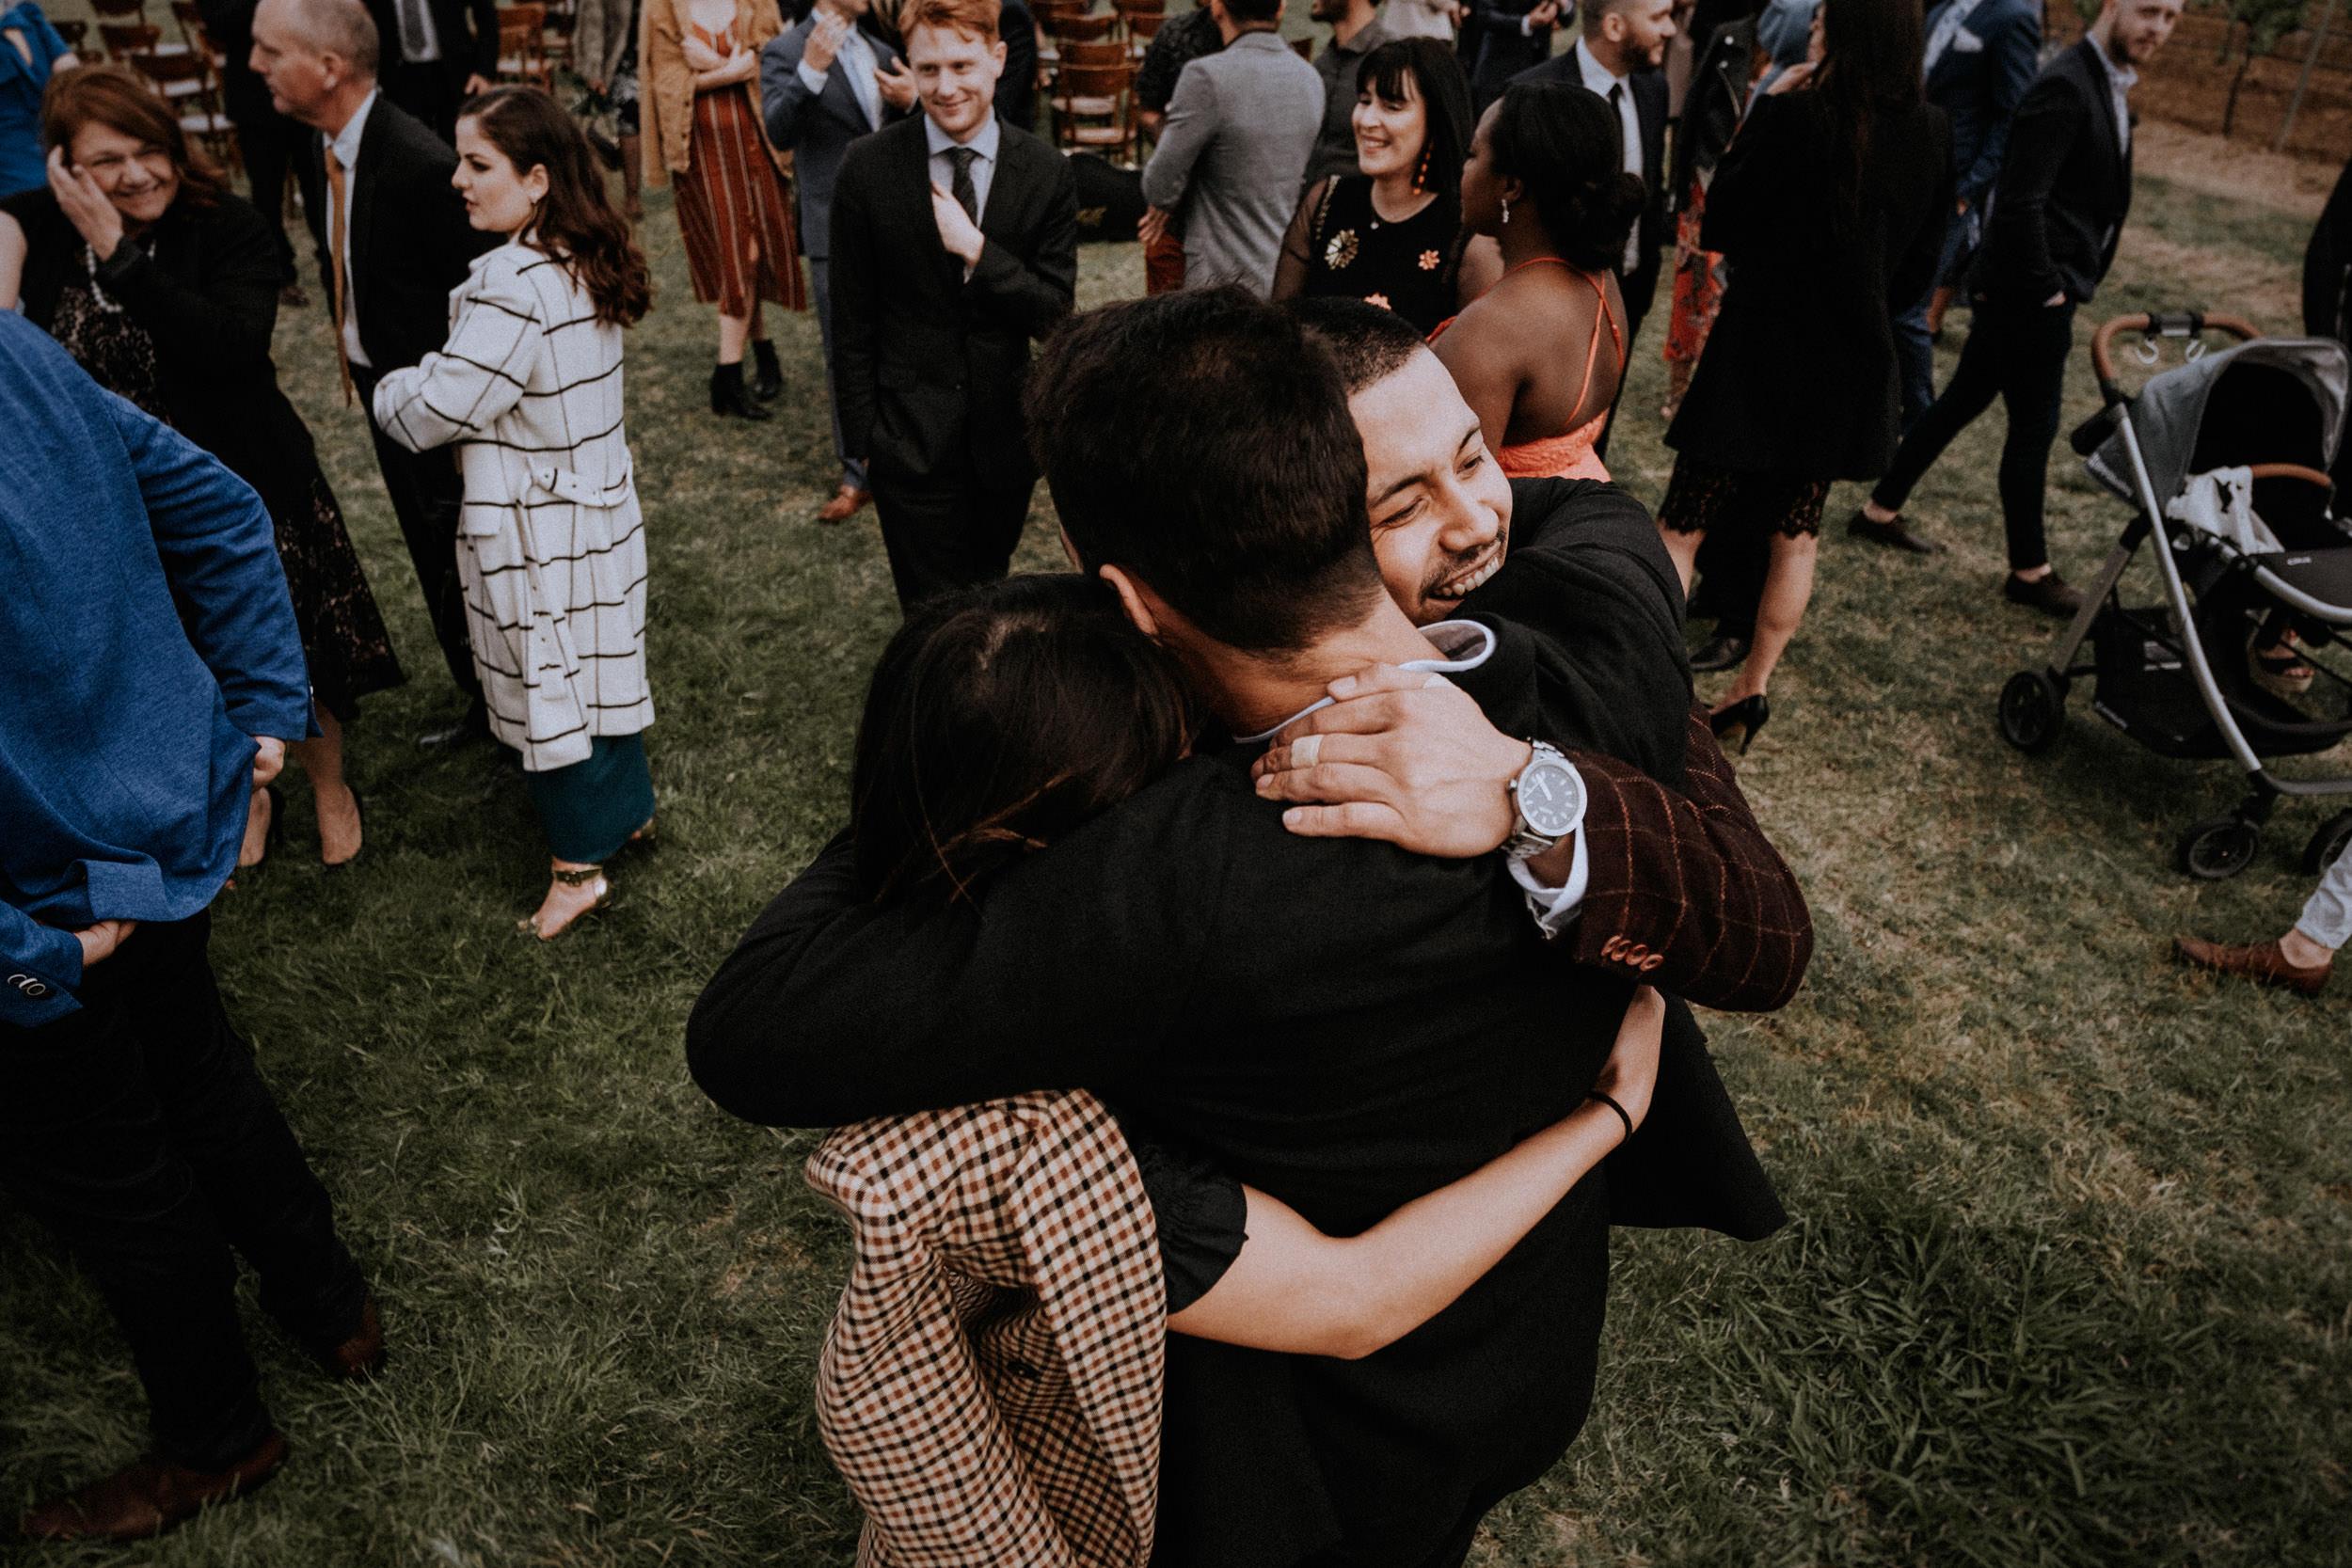 s+j_top_elopement wedding photography_kings & thieves_blog - 343.jpg